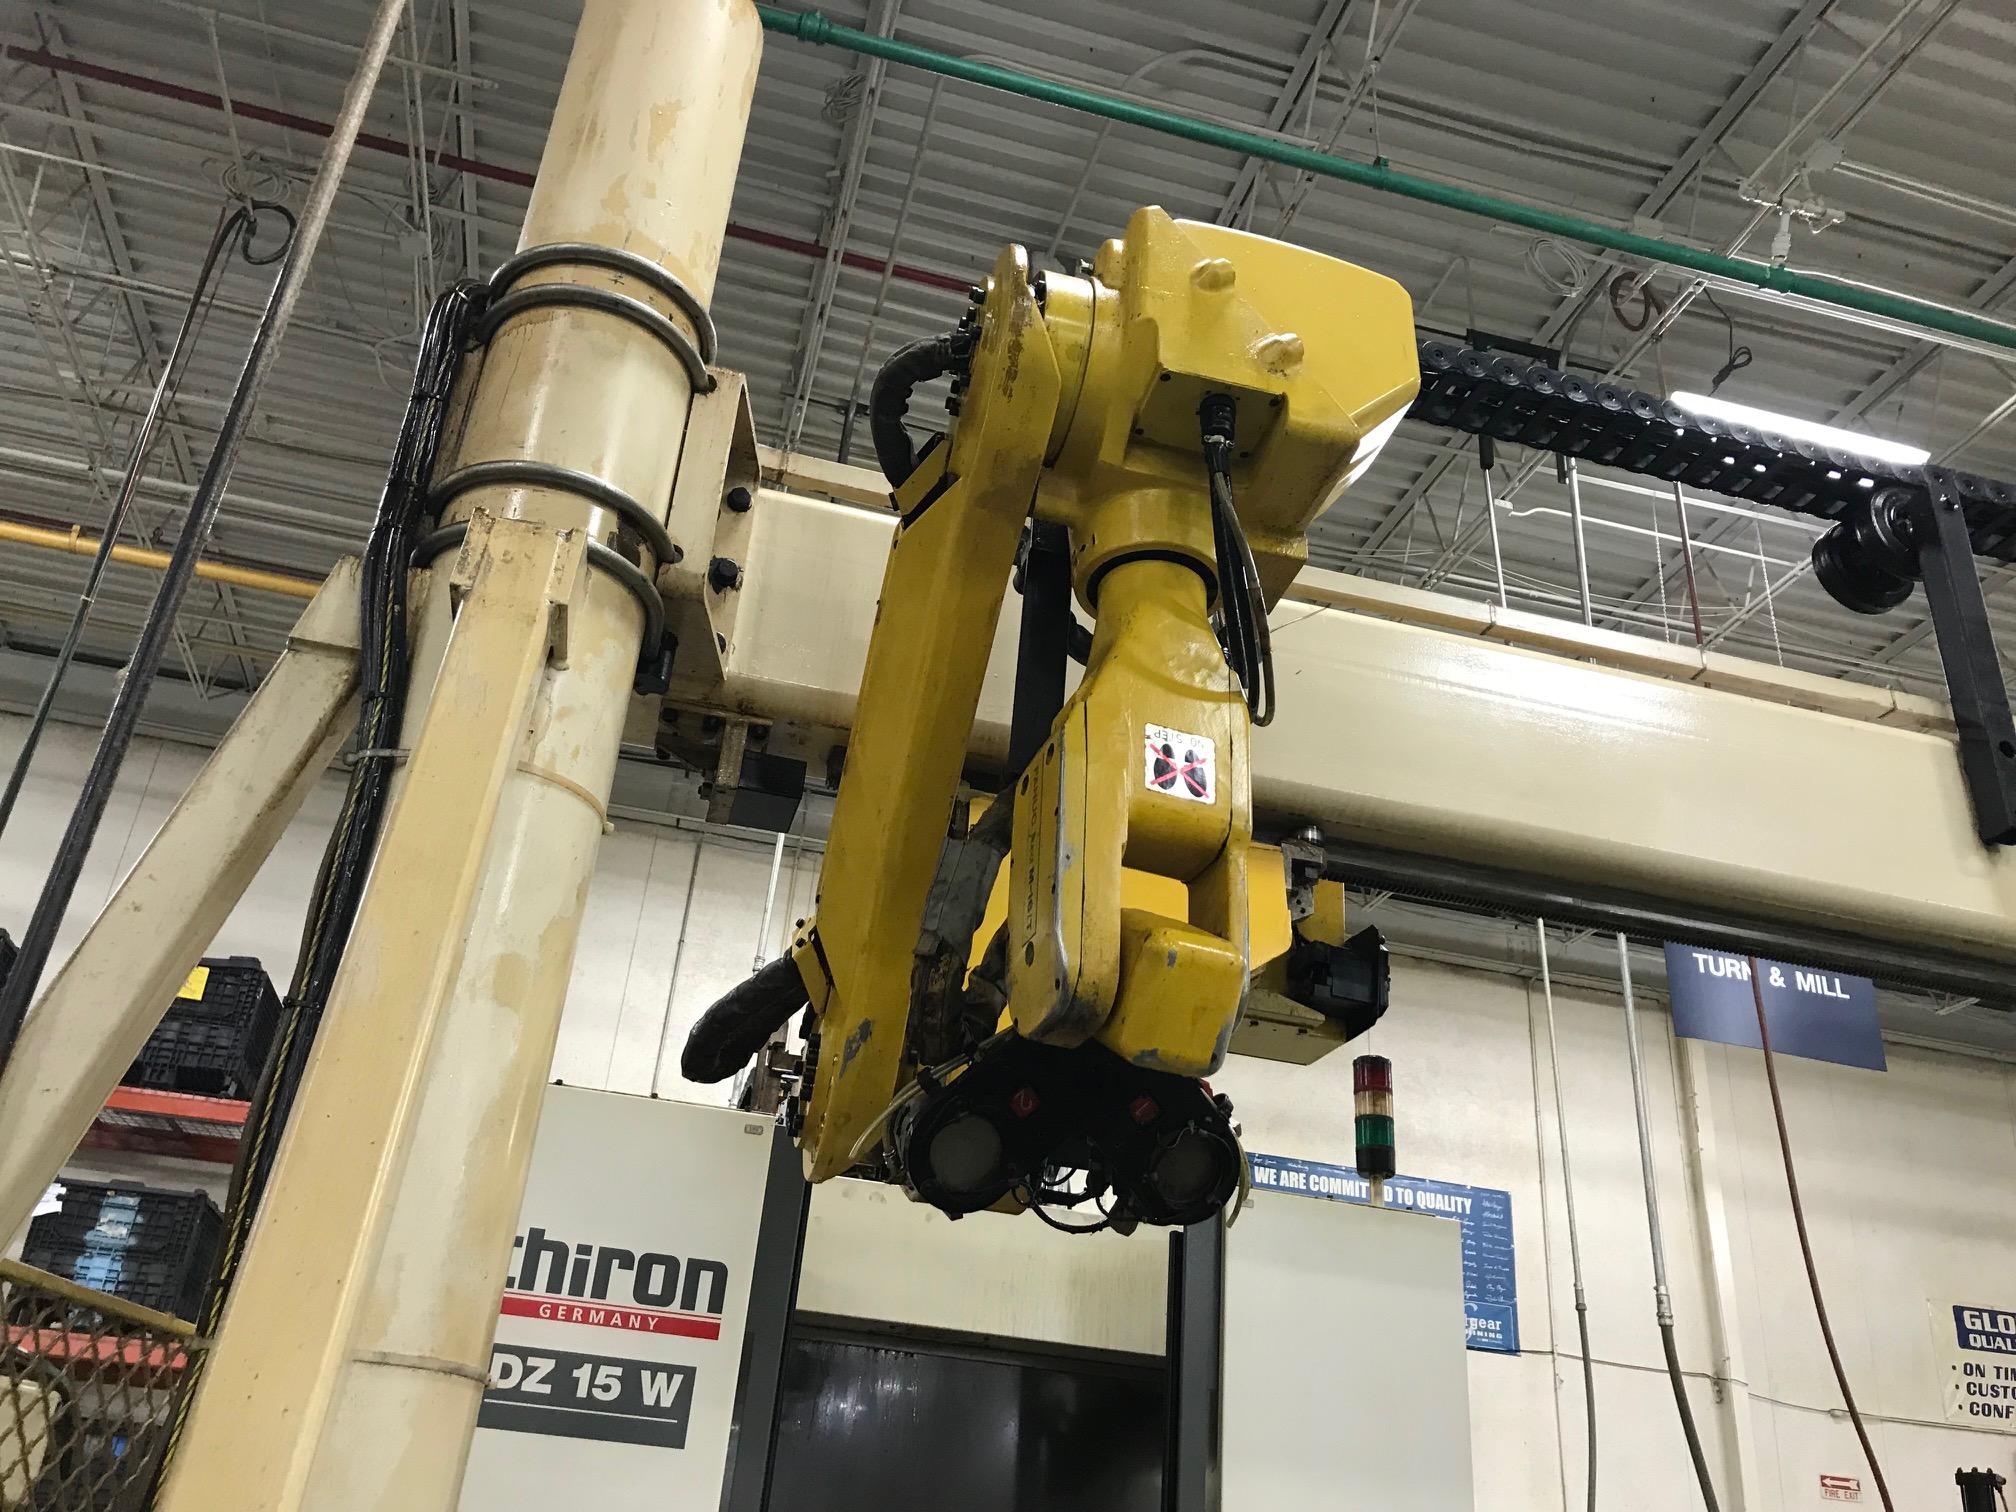 Lot 9 - FANUC GANTRY ROBOT WITH 23' RAIL, MODEL M-16IT, RJ3 CONTROL, SN E98Y0381, YEAR 11-99 LOCATION IL